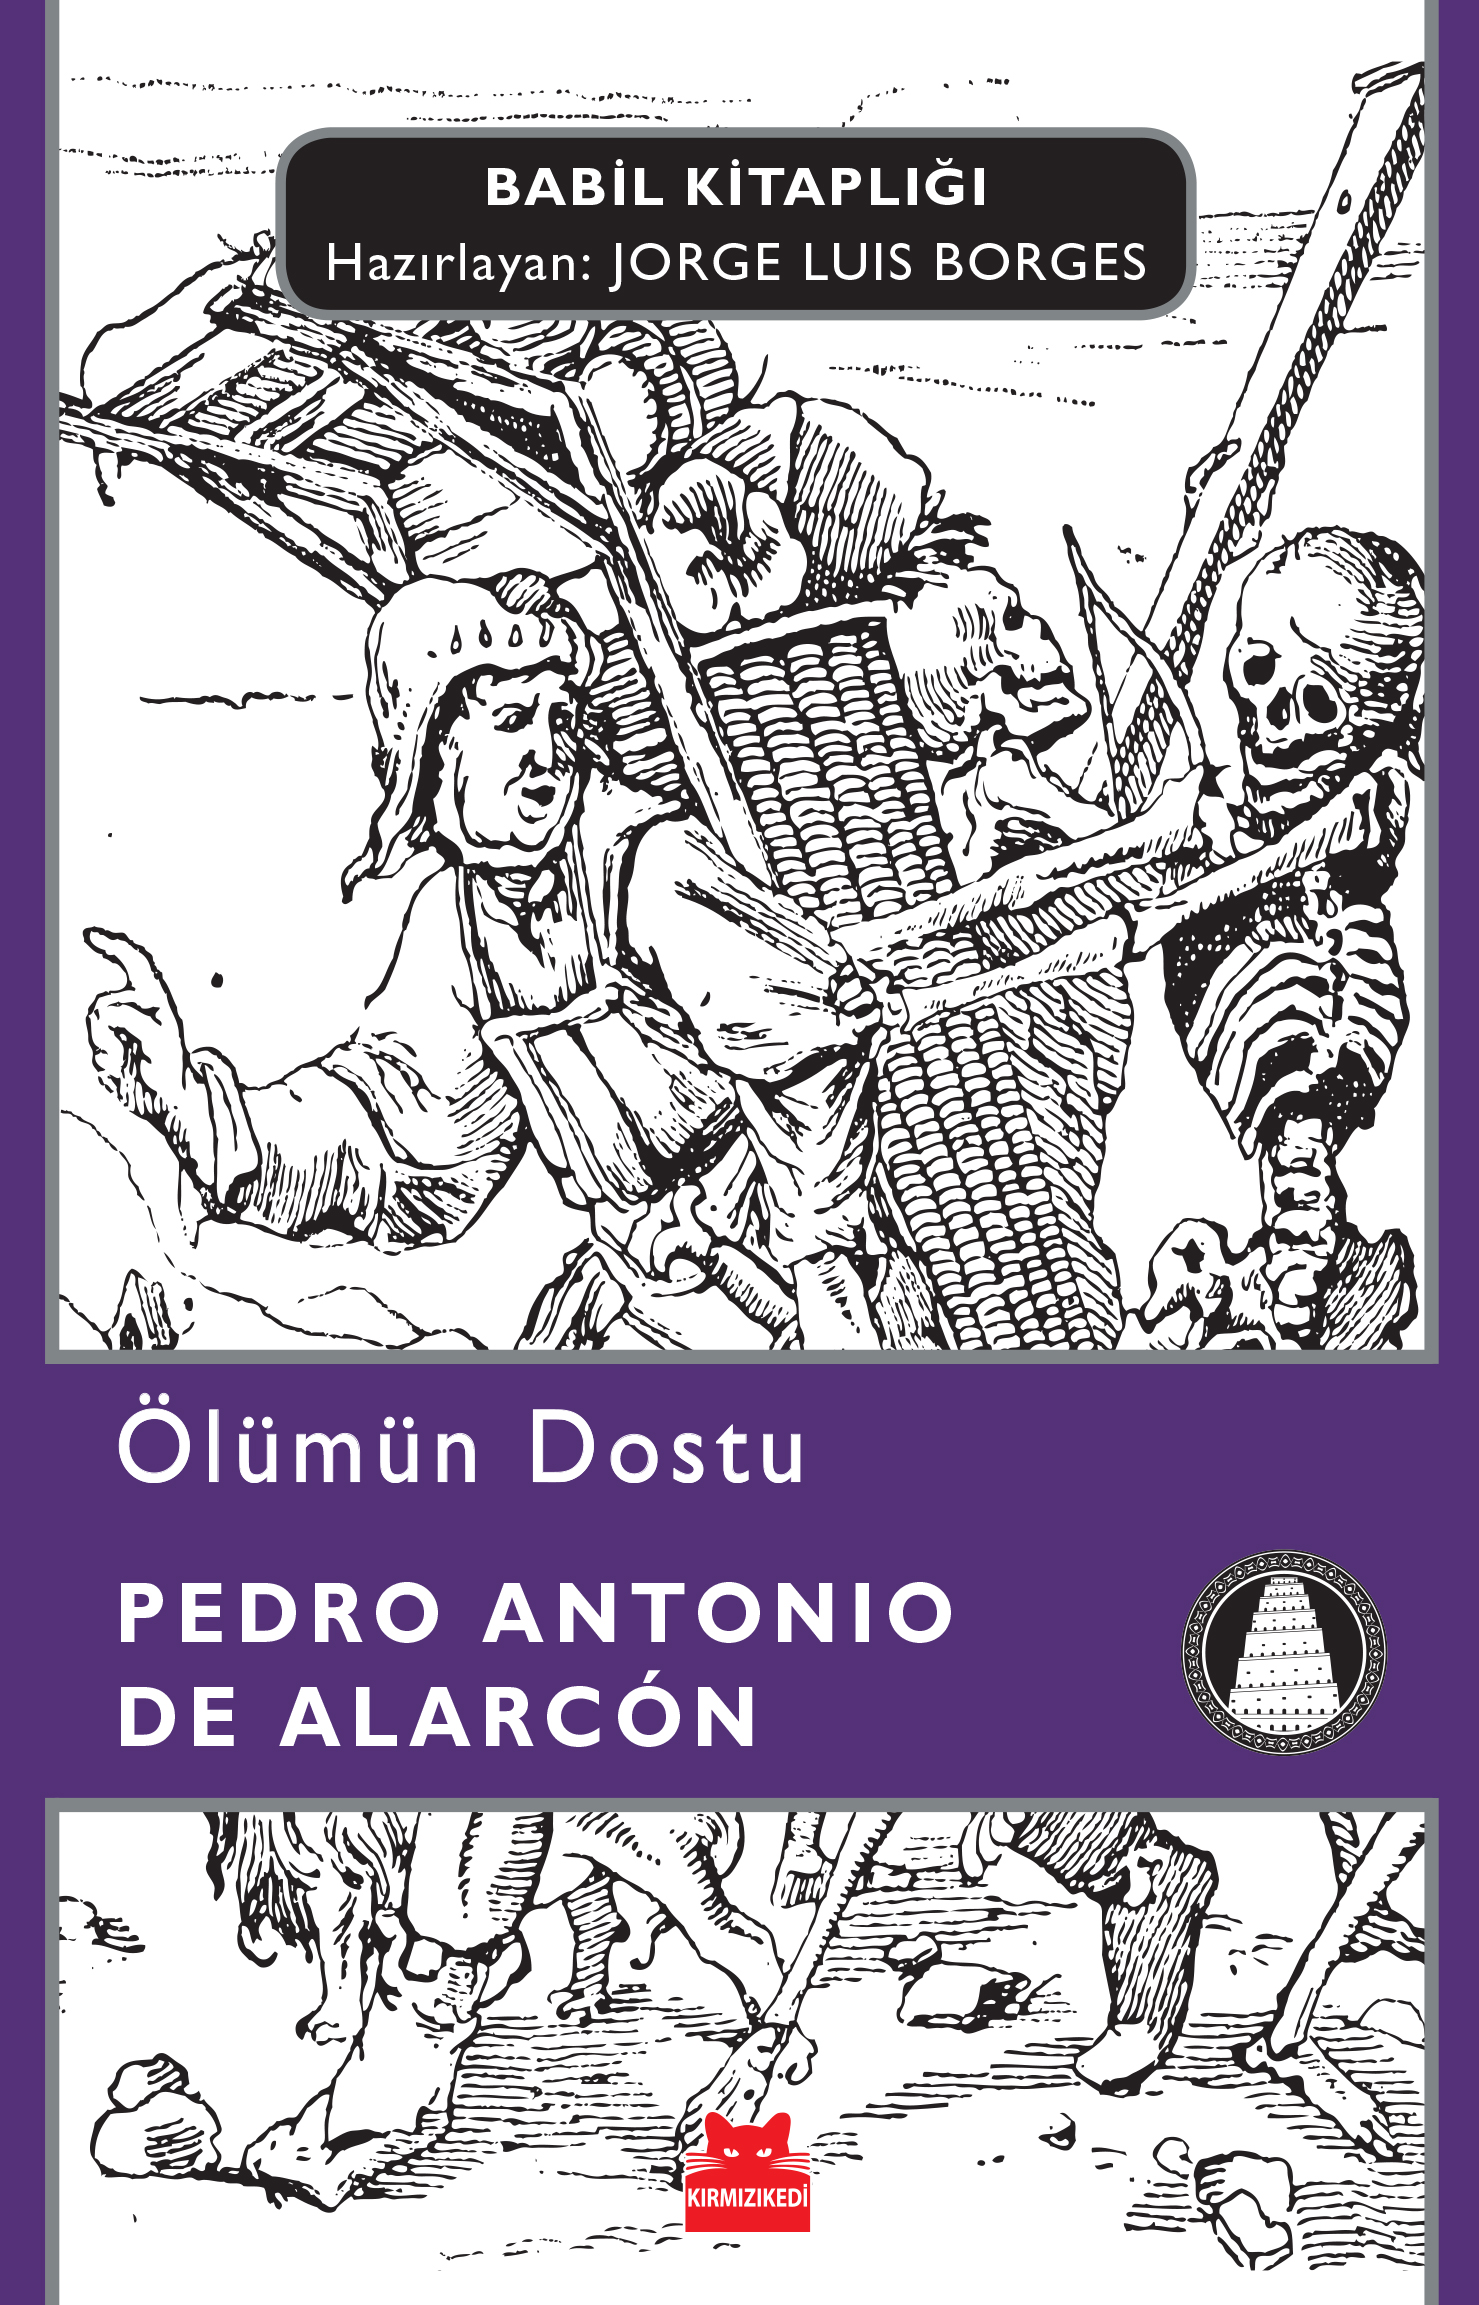 olumun_dostu_pedro-antonio-de-alarcon